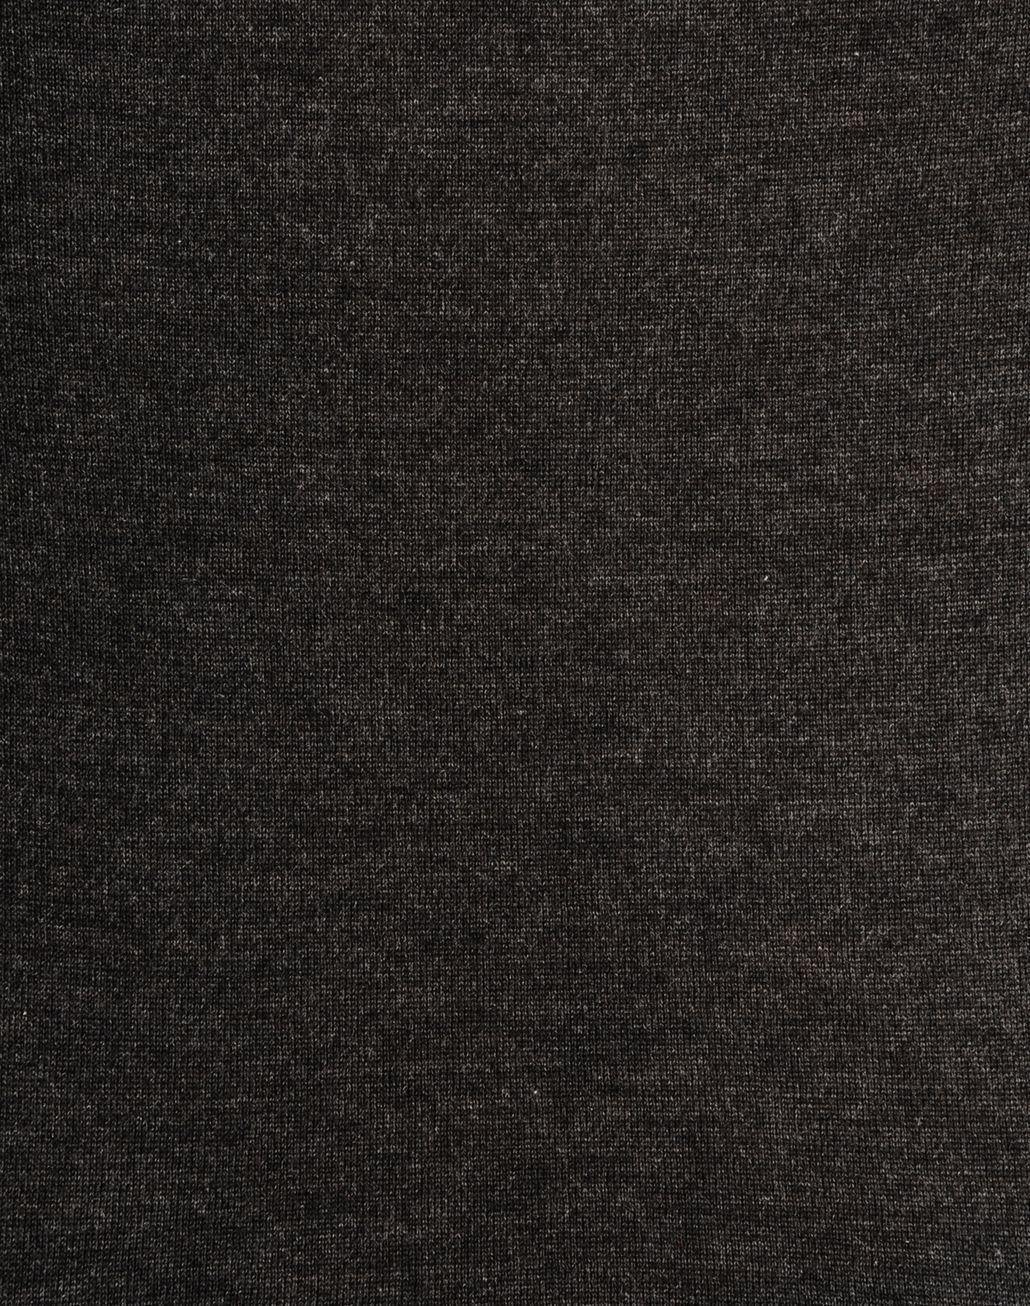 BRIONI POLO SHIRT Knitwear U e